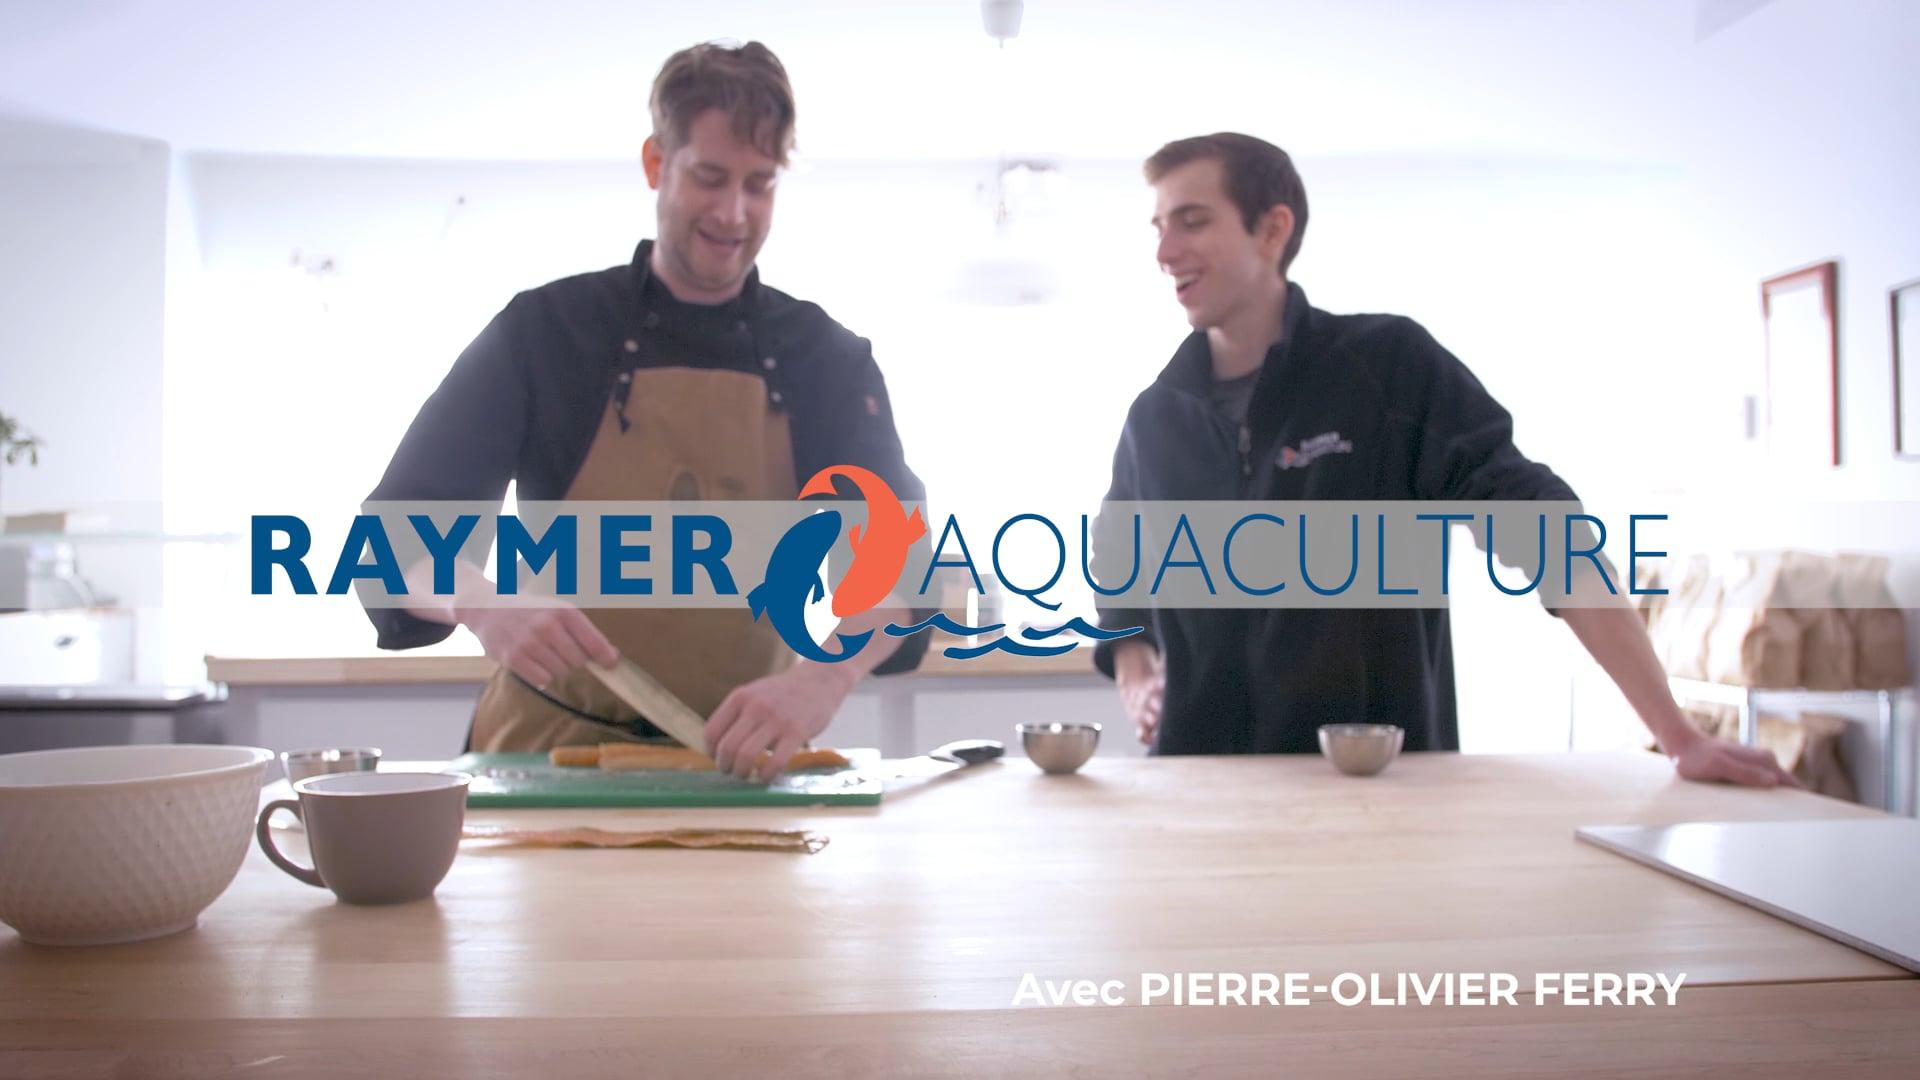 Rillette d'omble Raymer  avec Pierre-Olivier Ferry